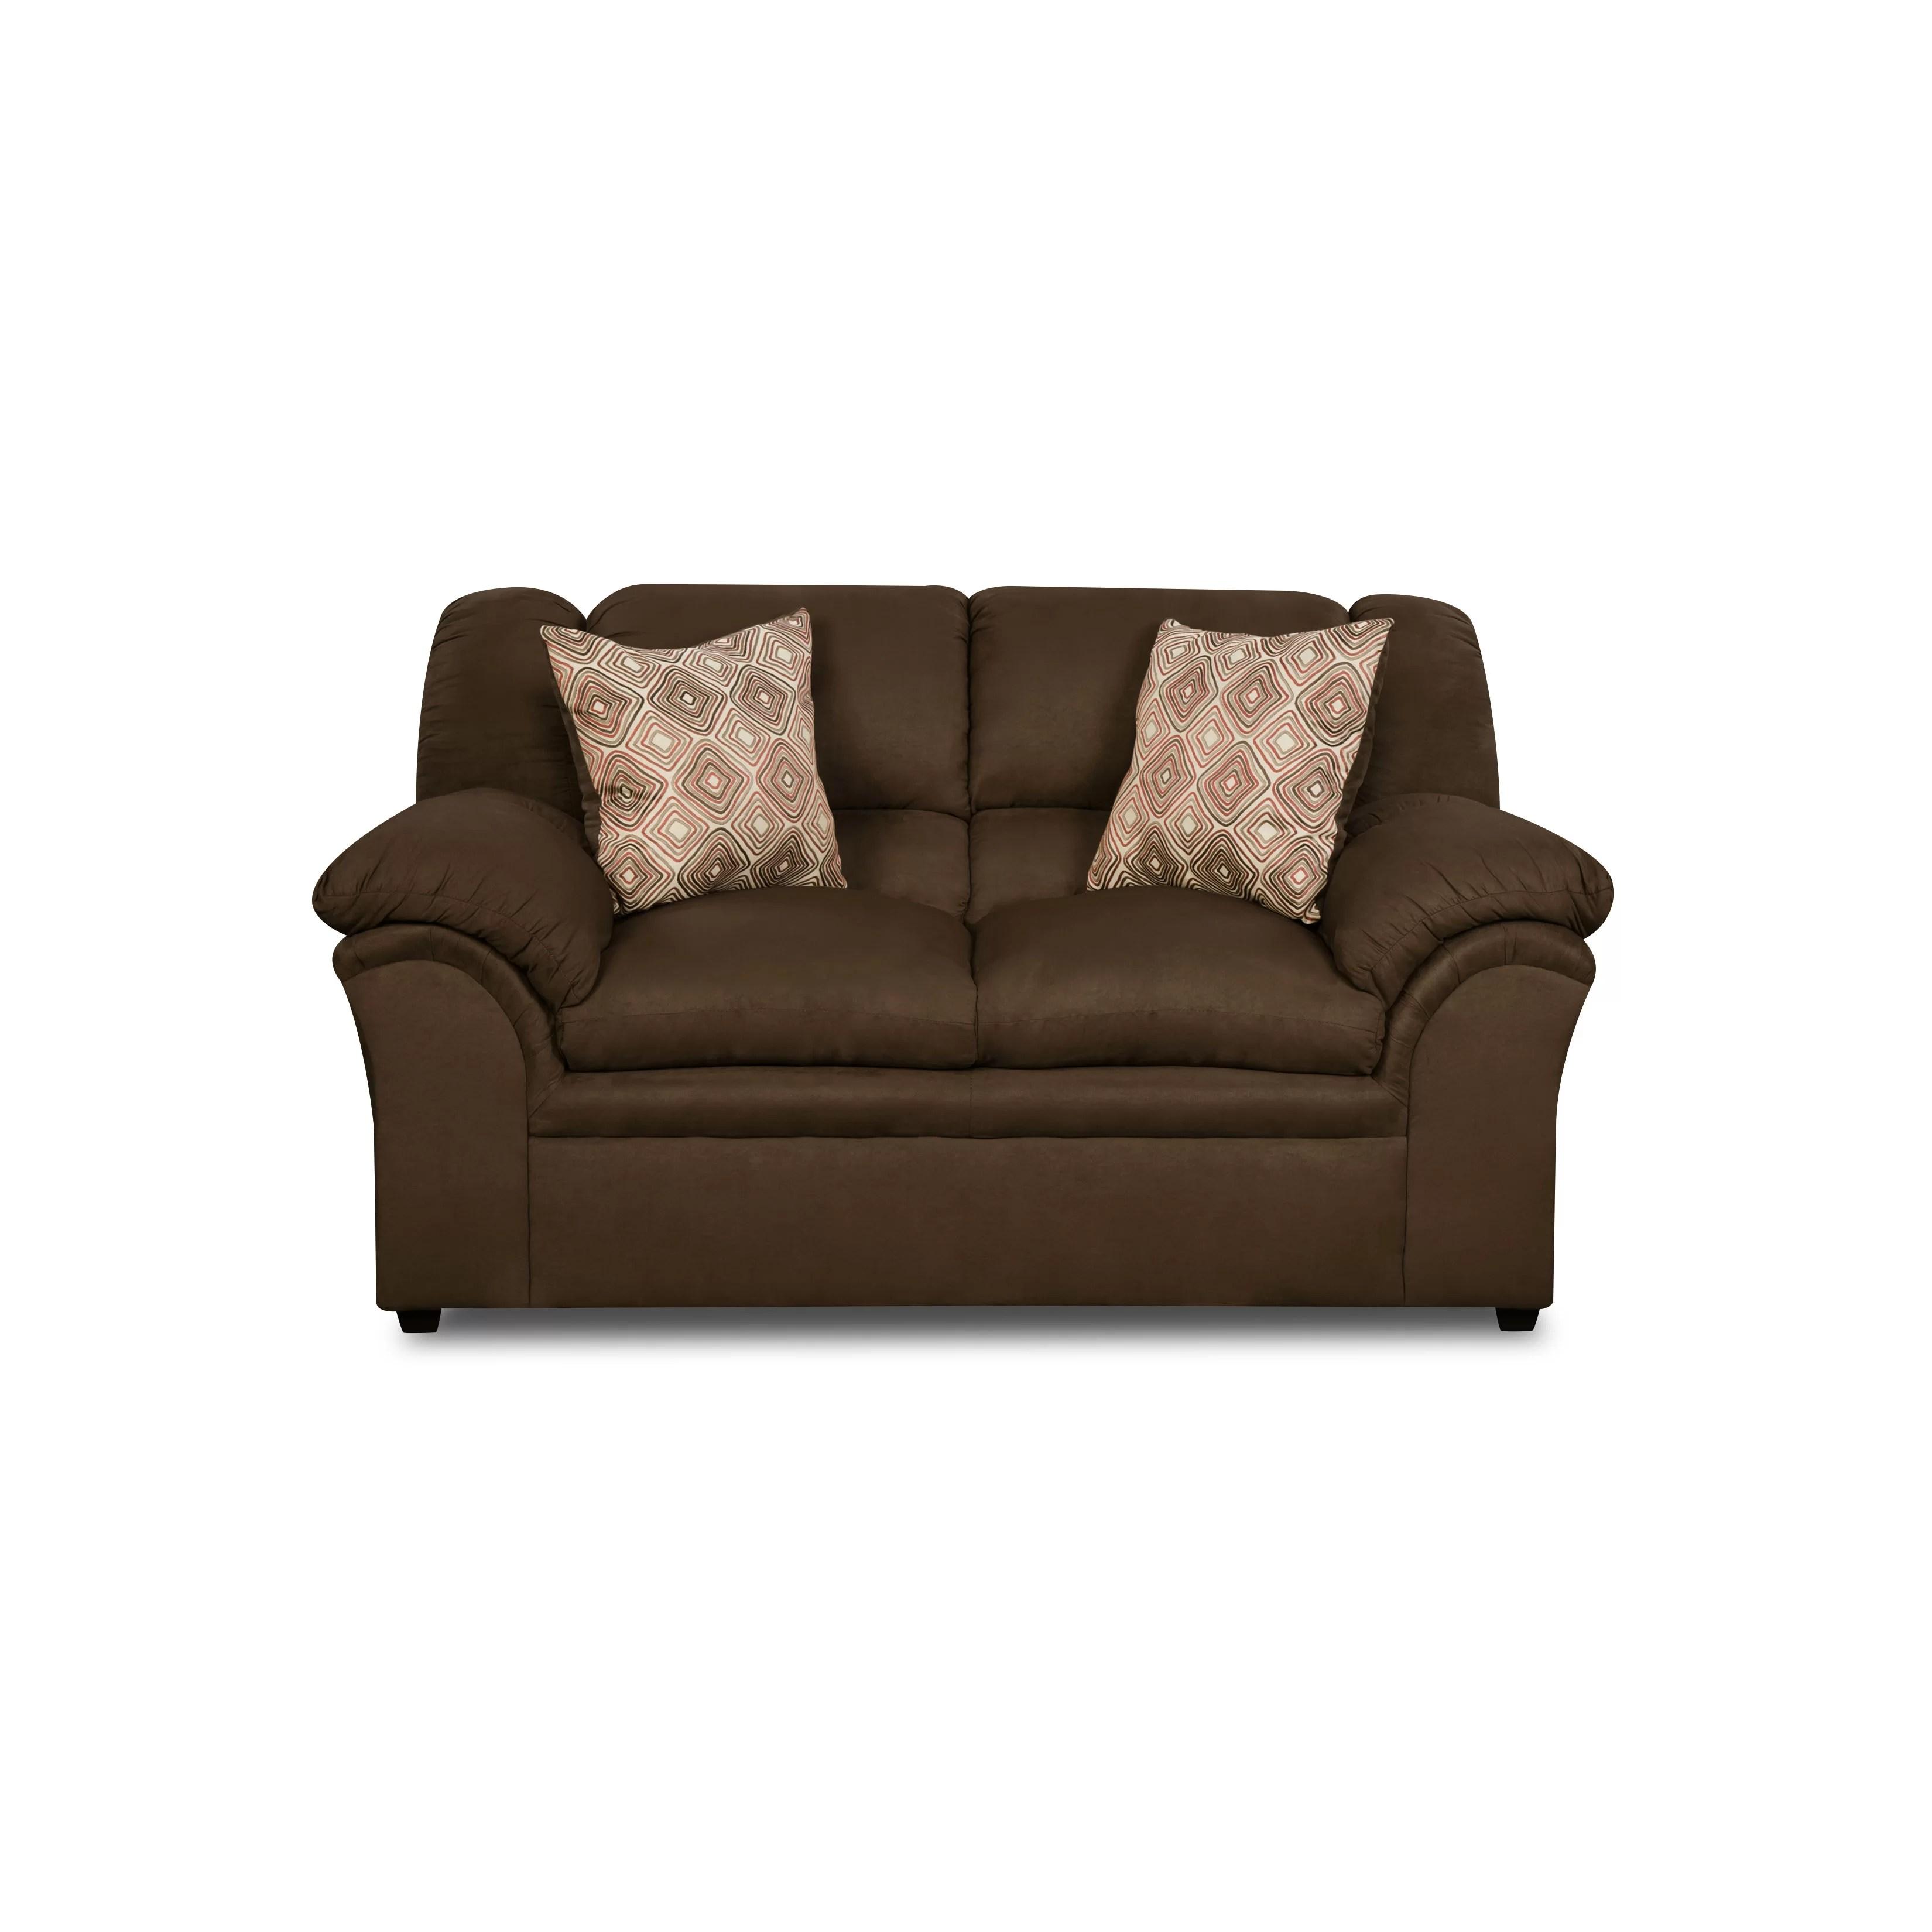 simmons sofa and loveseat sofas camas modernos en venezuela upholstery venture reviews wayfair